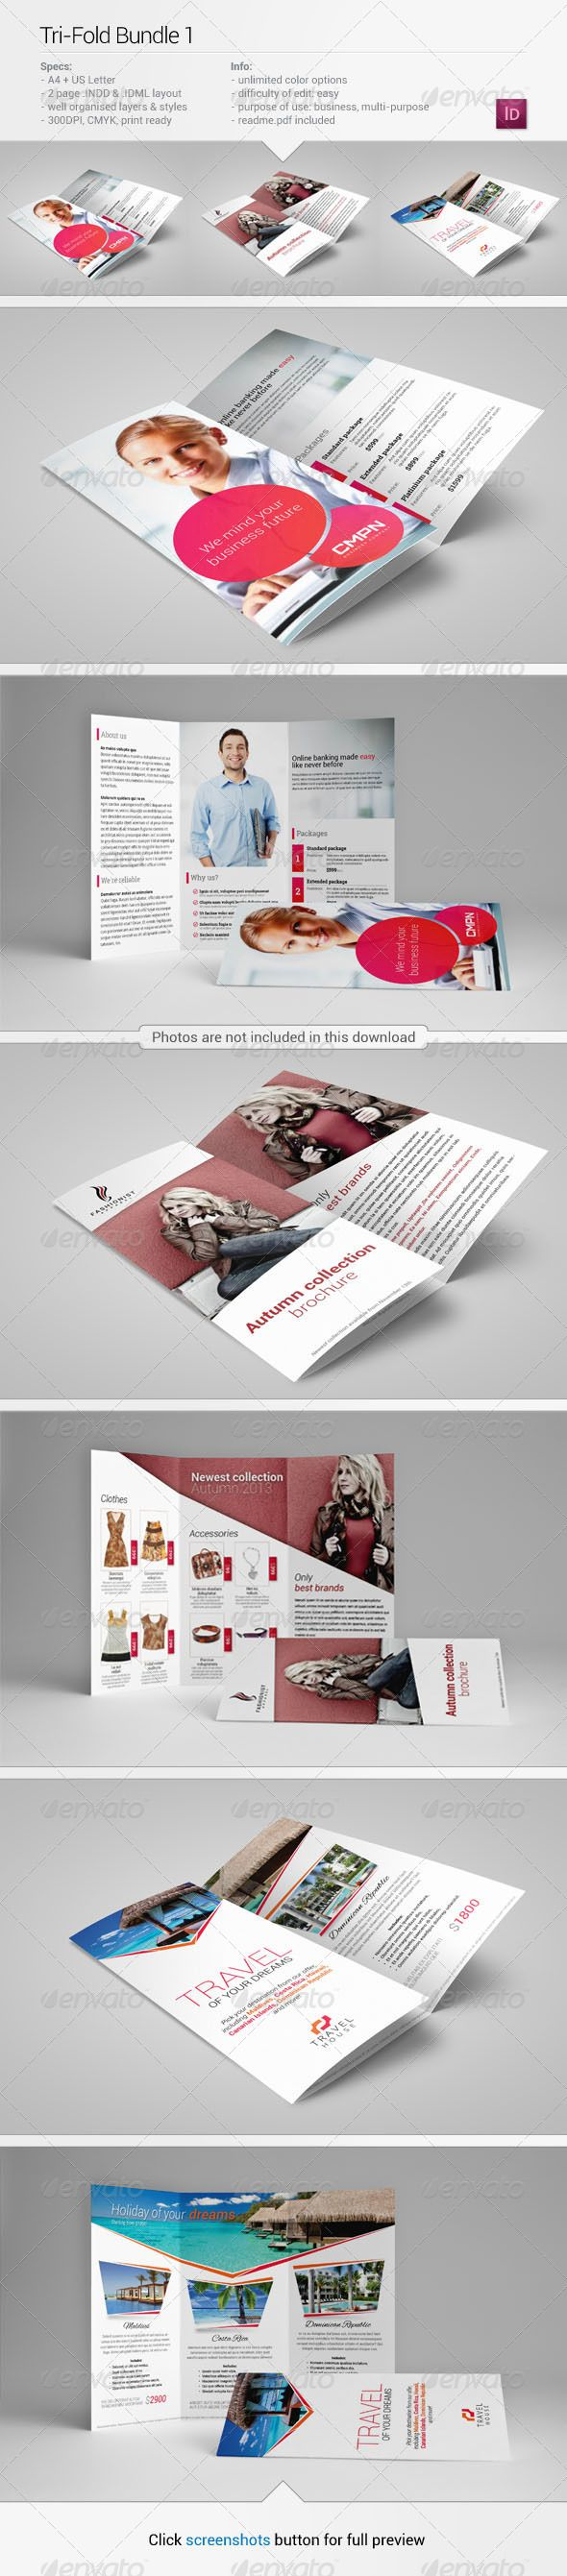 Realistic Graphic DOWNLOAD (.ai, .psd) :: http://jquery.re/pinterest-itmid-1006056535i.html ... Tri-Fold Bundle 1 ...  Trifolder, banking, brochure, bundle, business, clothing, commerce, corporat, couple, design, few, fold, graphic, leaflet, market, money, pack, pamphlet, print, template, three, threefold, travel, tri, tri-fold, trifold  ... Realistic Photo Graphic Print Obejct Business Web Elements Illustration Design Templates ... DOWNLOAD…